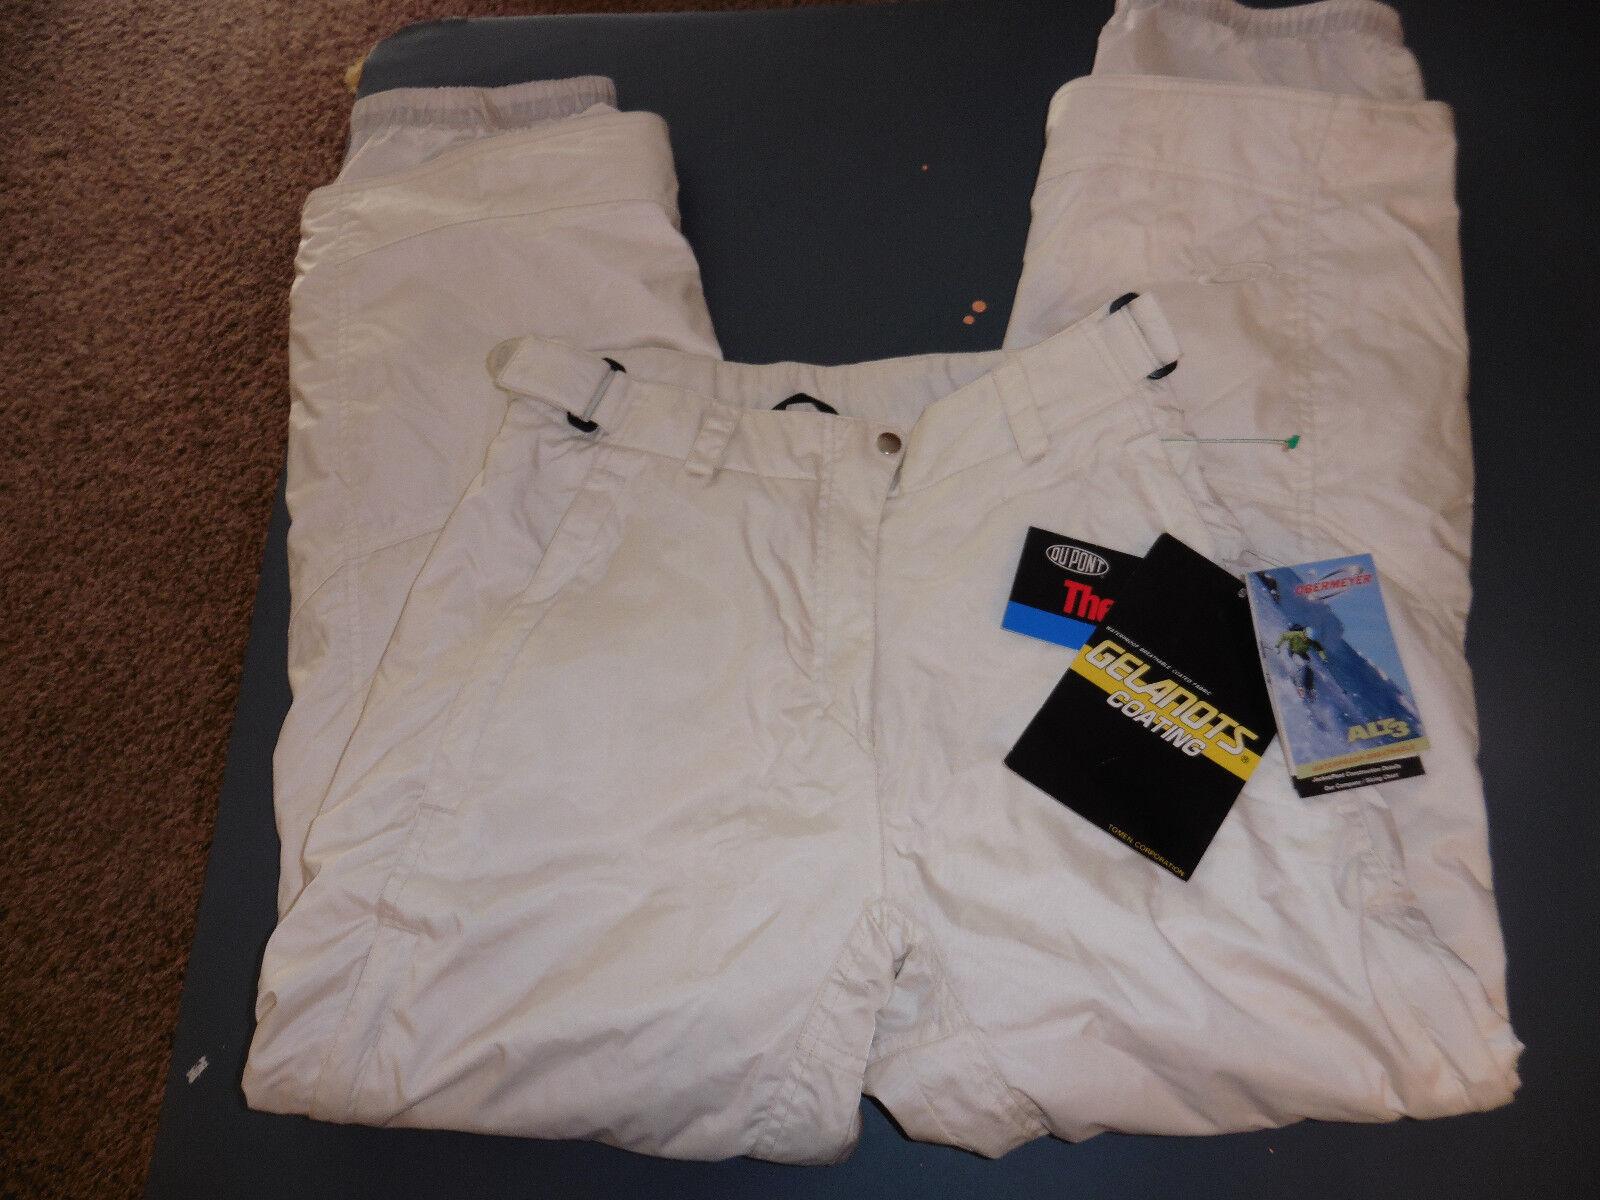 NWT womens obermeyer ski pants lined white sz 8 white